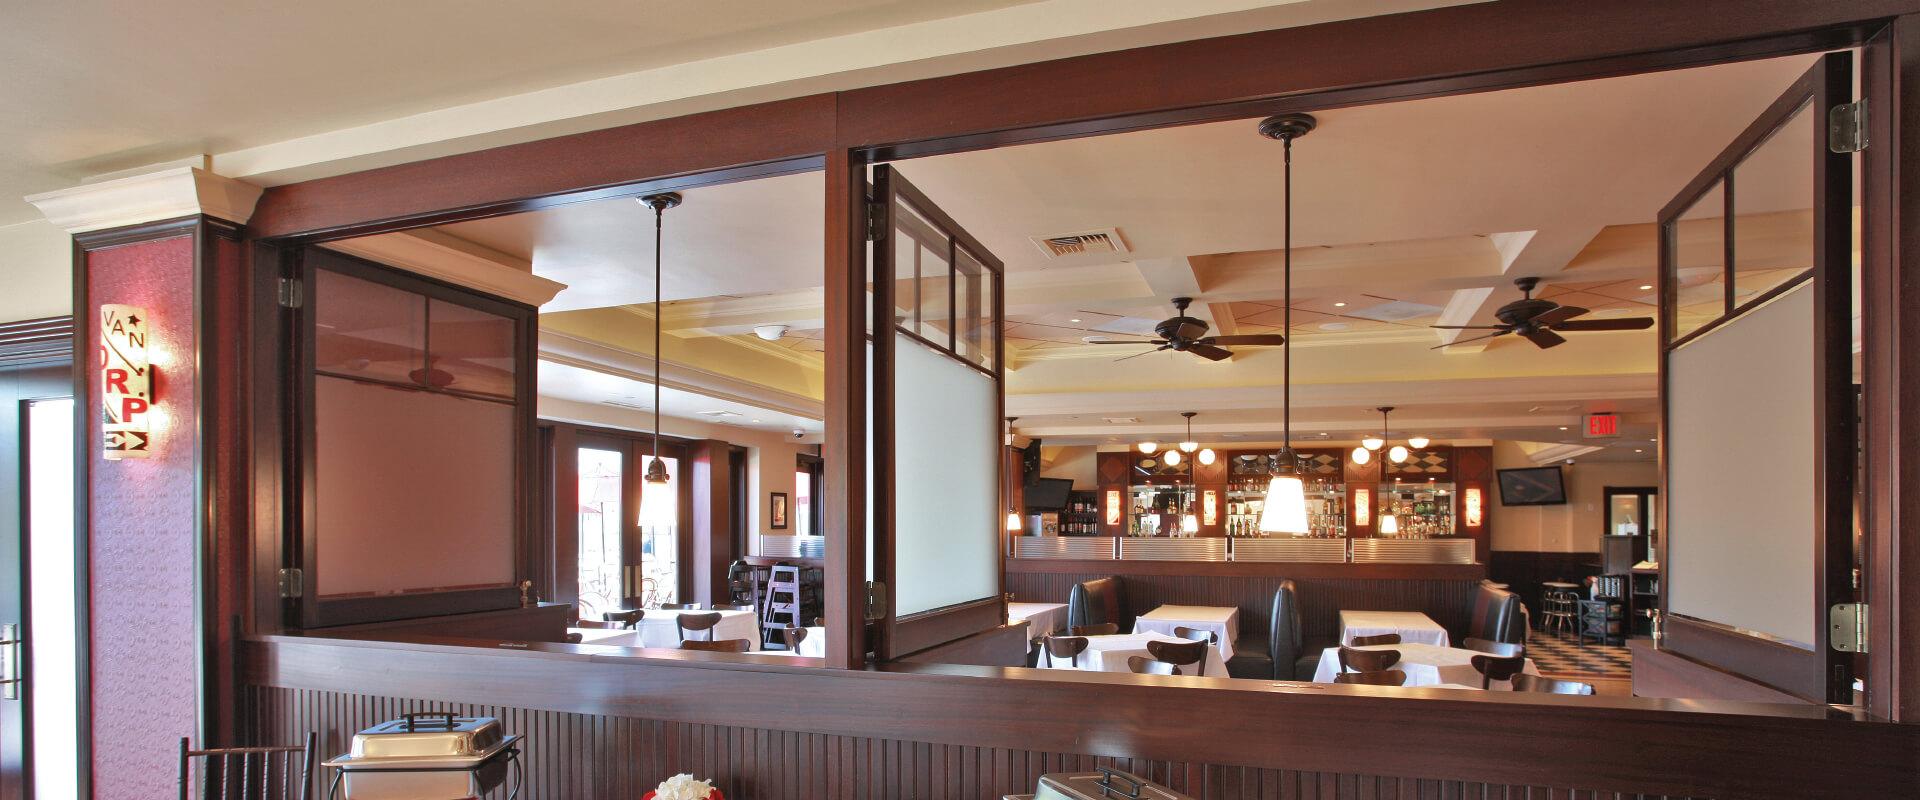 Heritage Series Inswing Casement Windows   Kolbe Windows ...